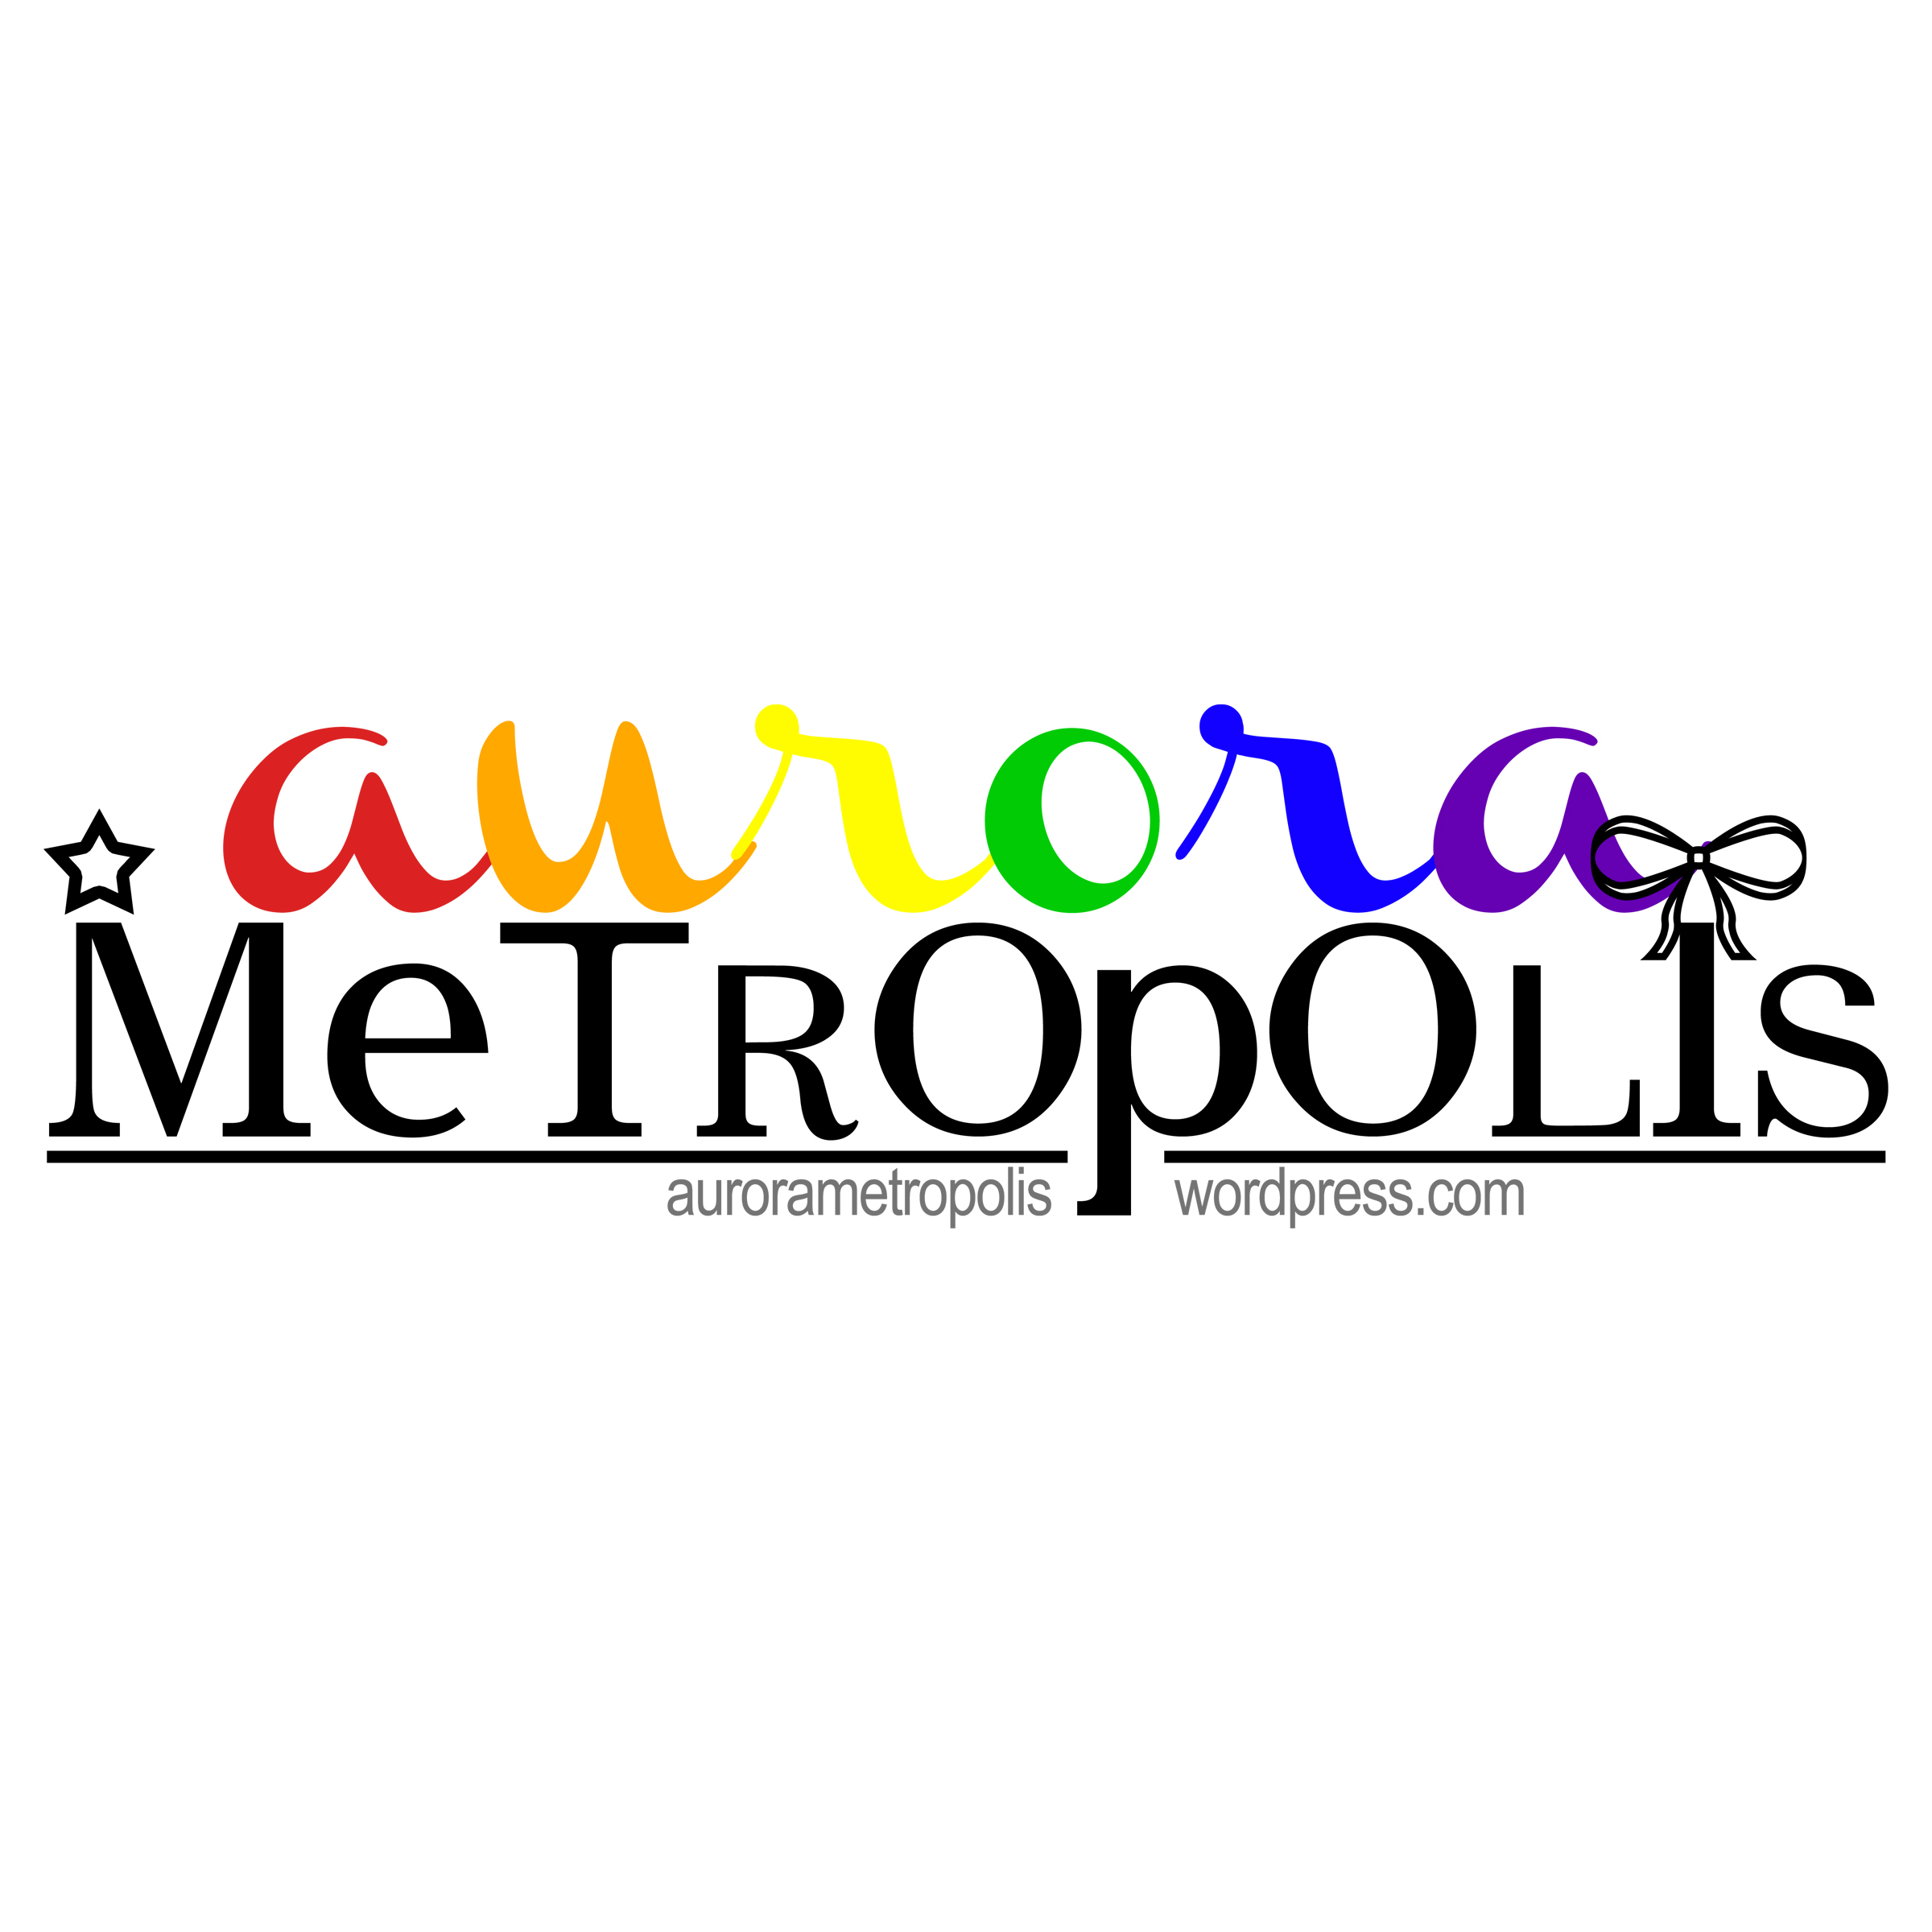 Aurora Metropolis